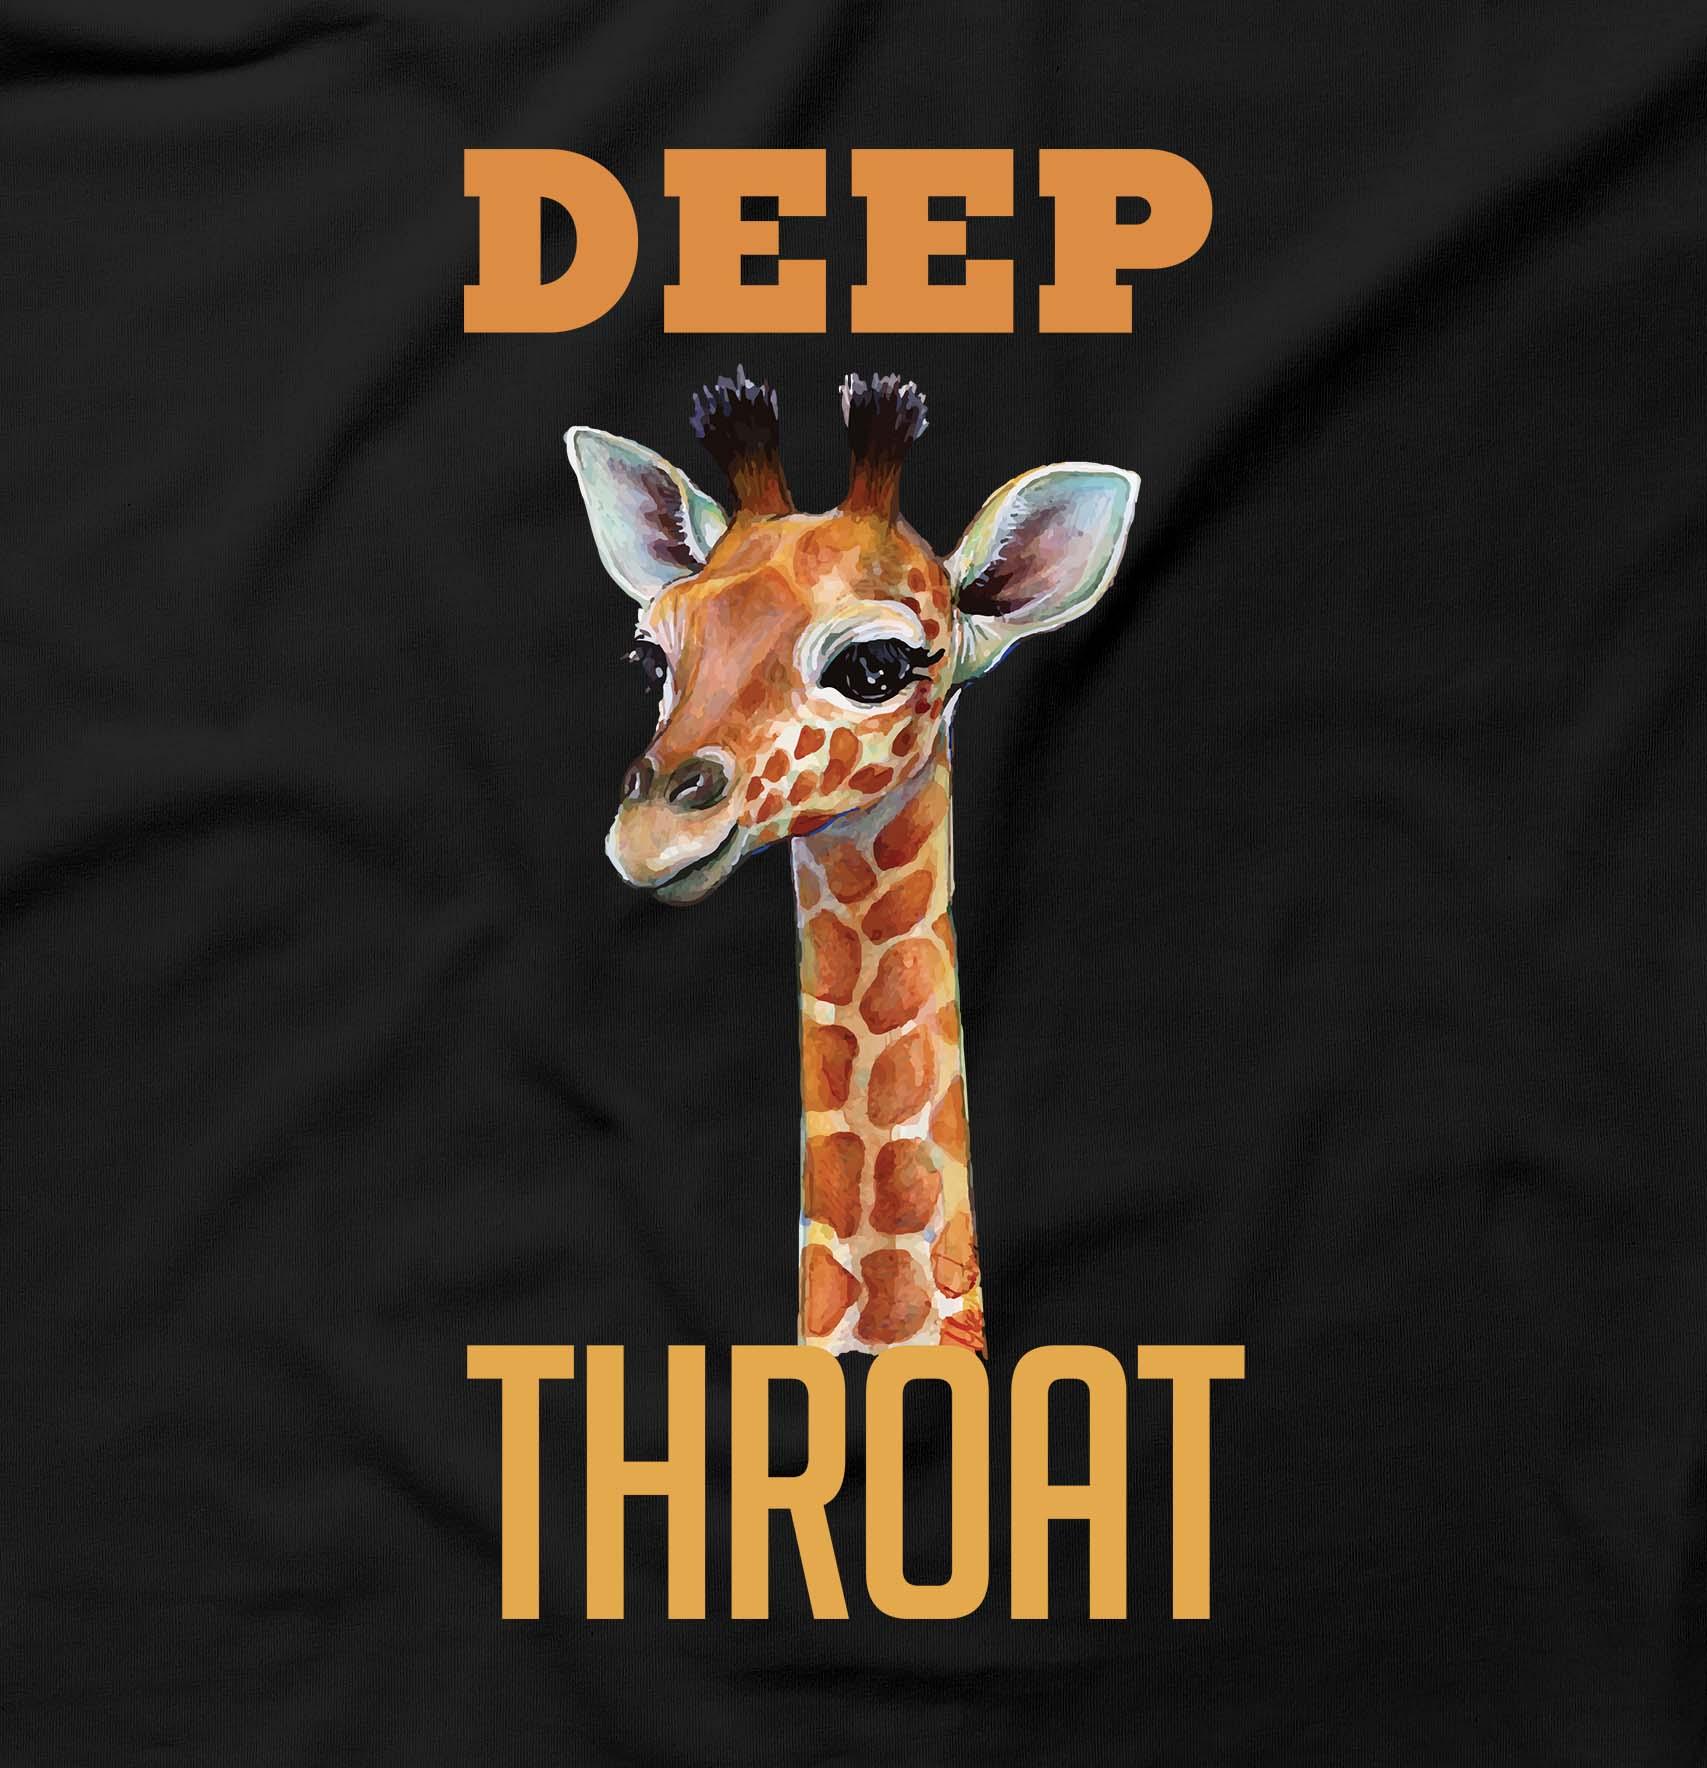 Deep Throat Funny Giraffe Rude Offensive Humour BJ